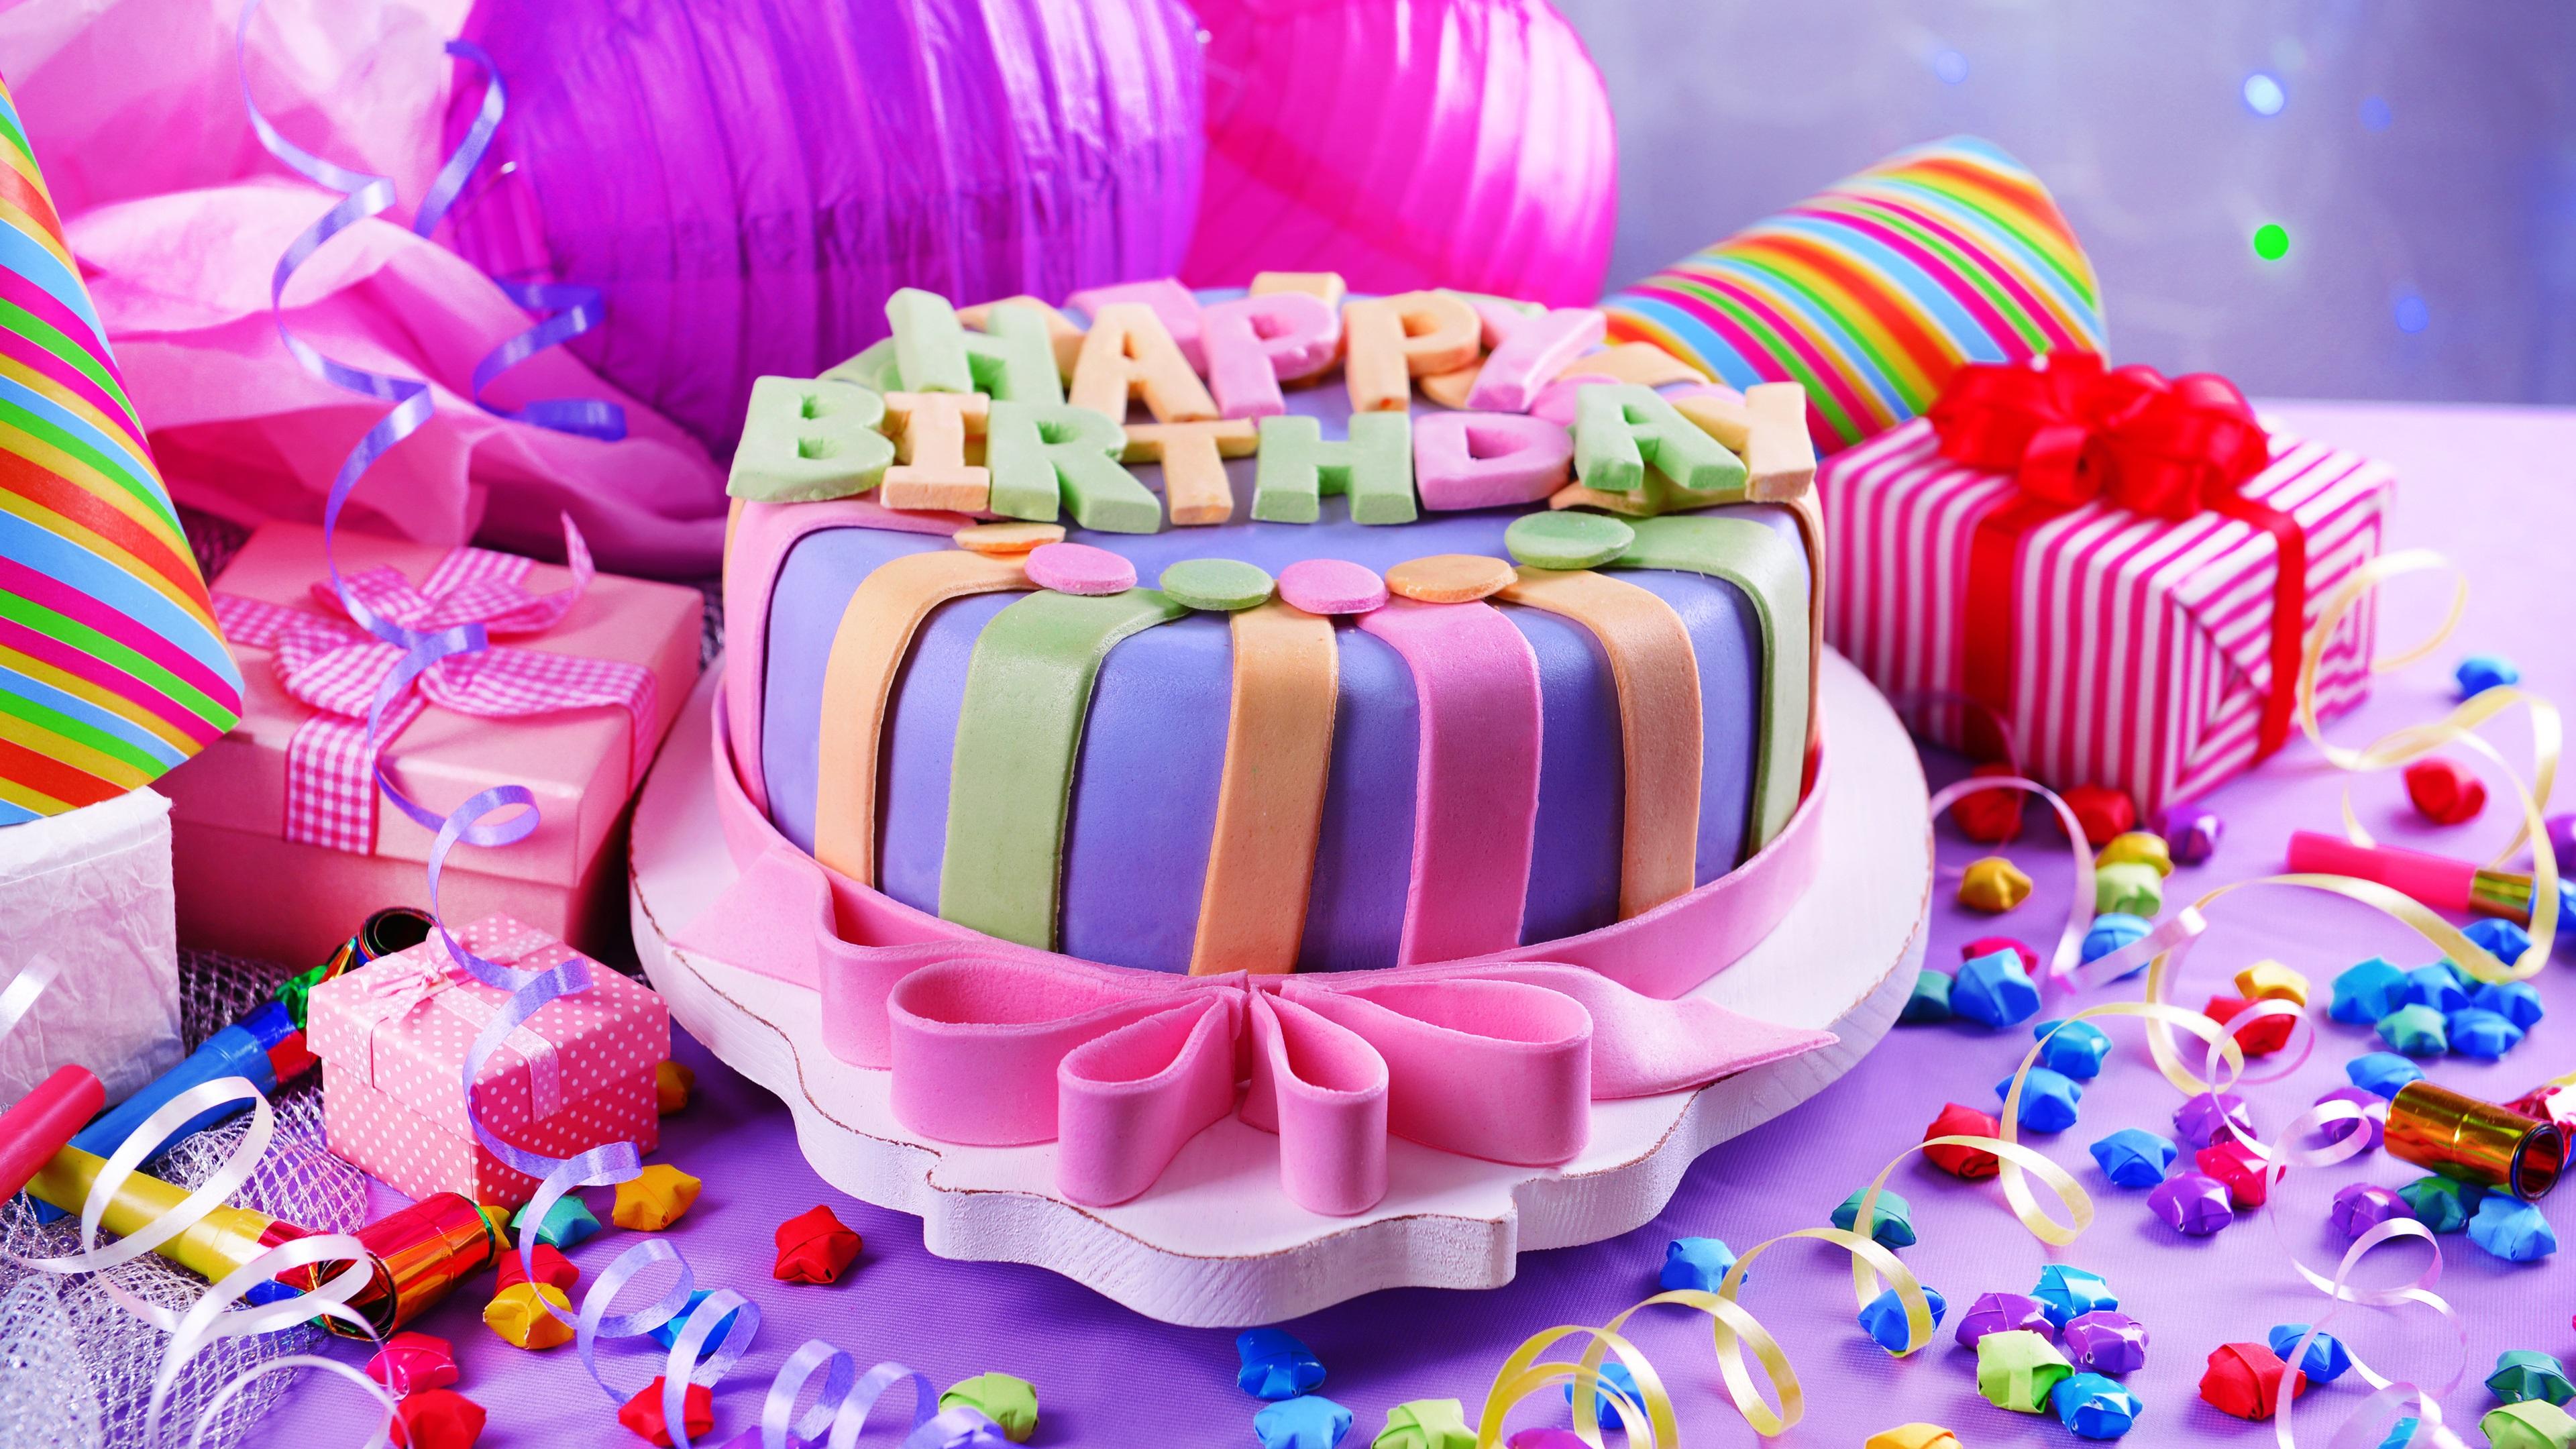 Iphone Birthday Cake For Girls